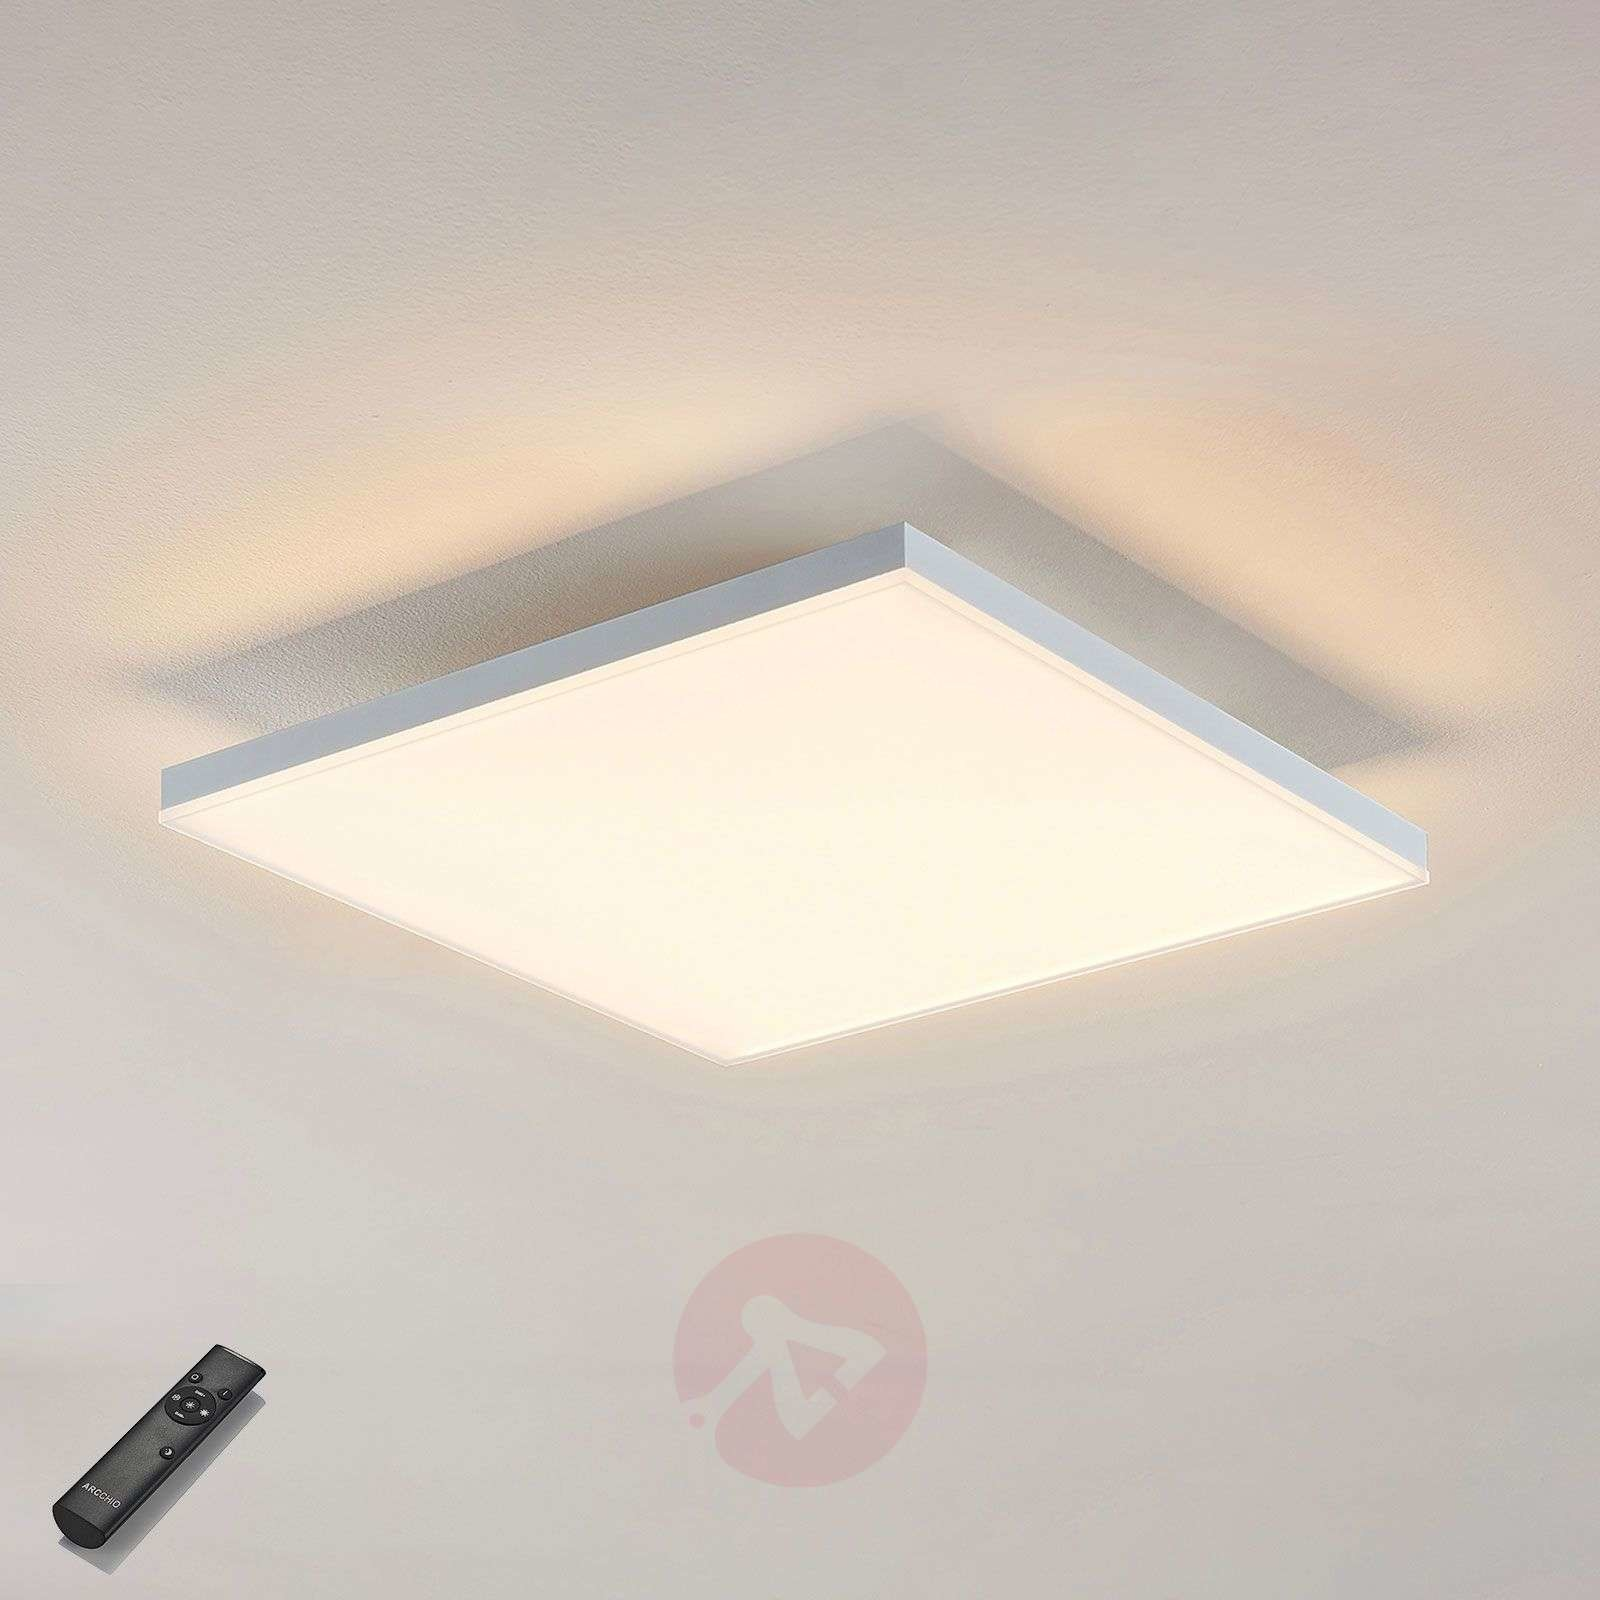 Lampenwelt com Panel LED Blaan CCT z pilotem 39,5 x 39,5cm